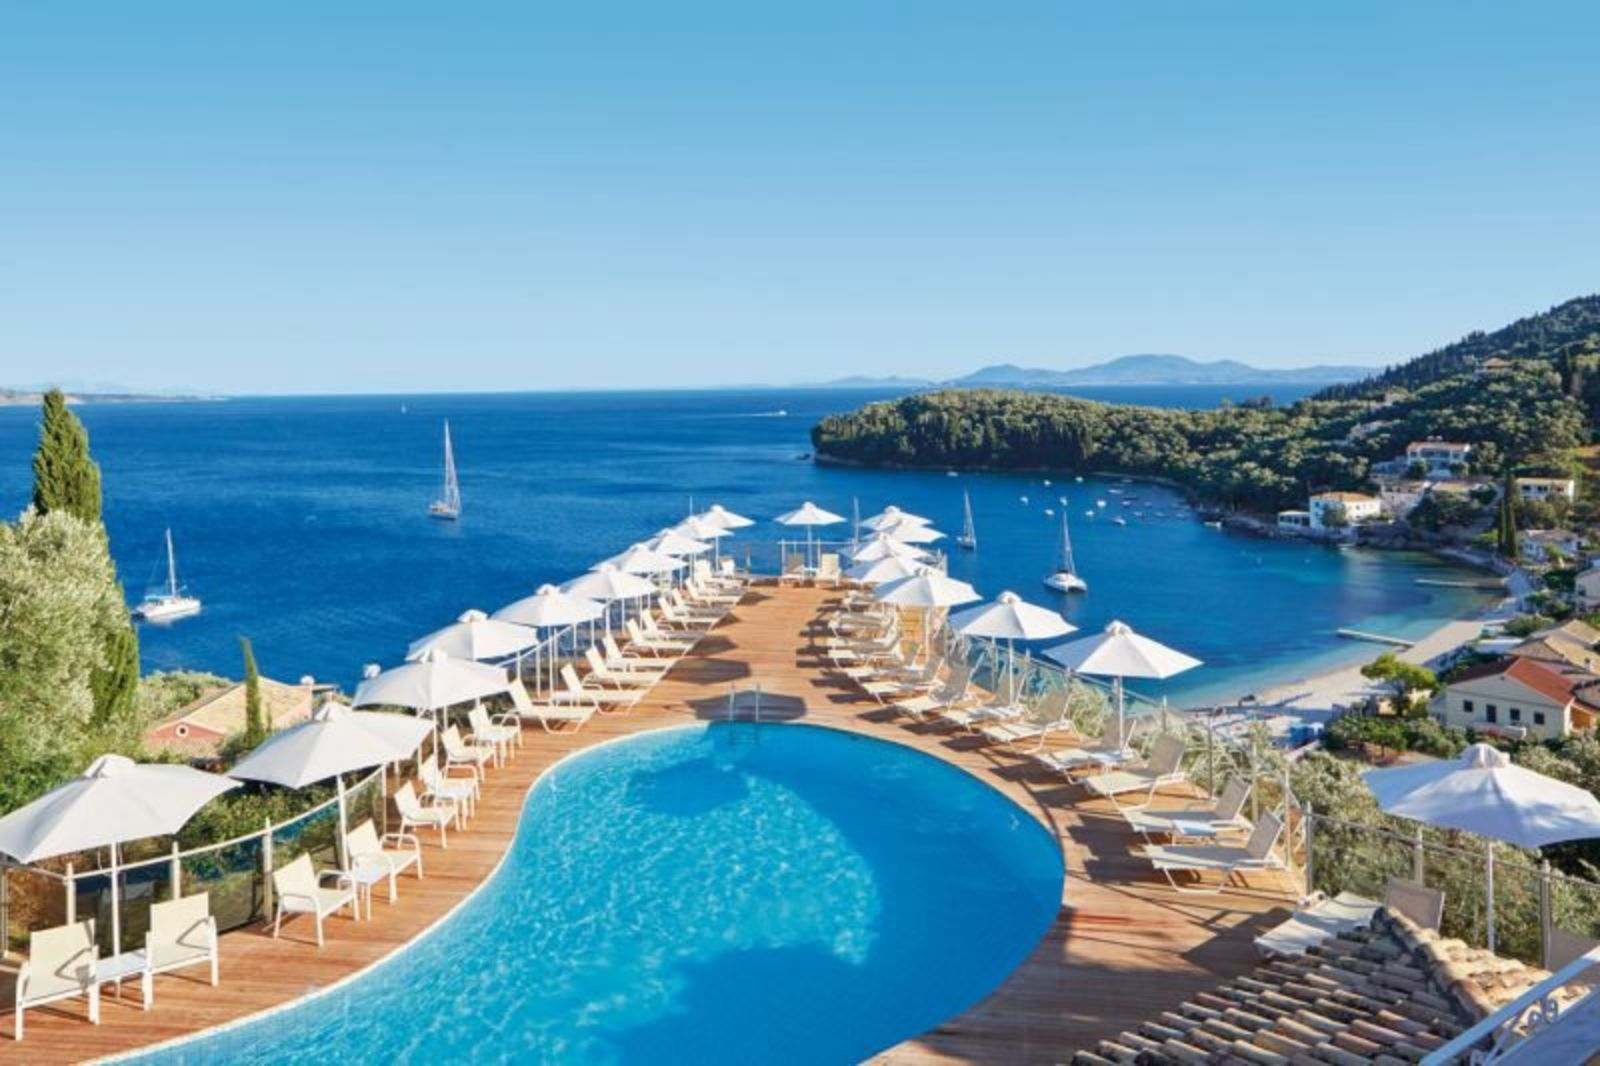 Hotel San Antonio Corfu, Corfu, Greece